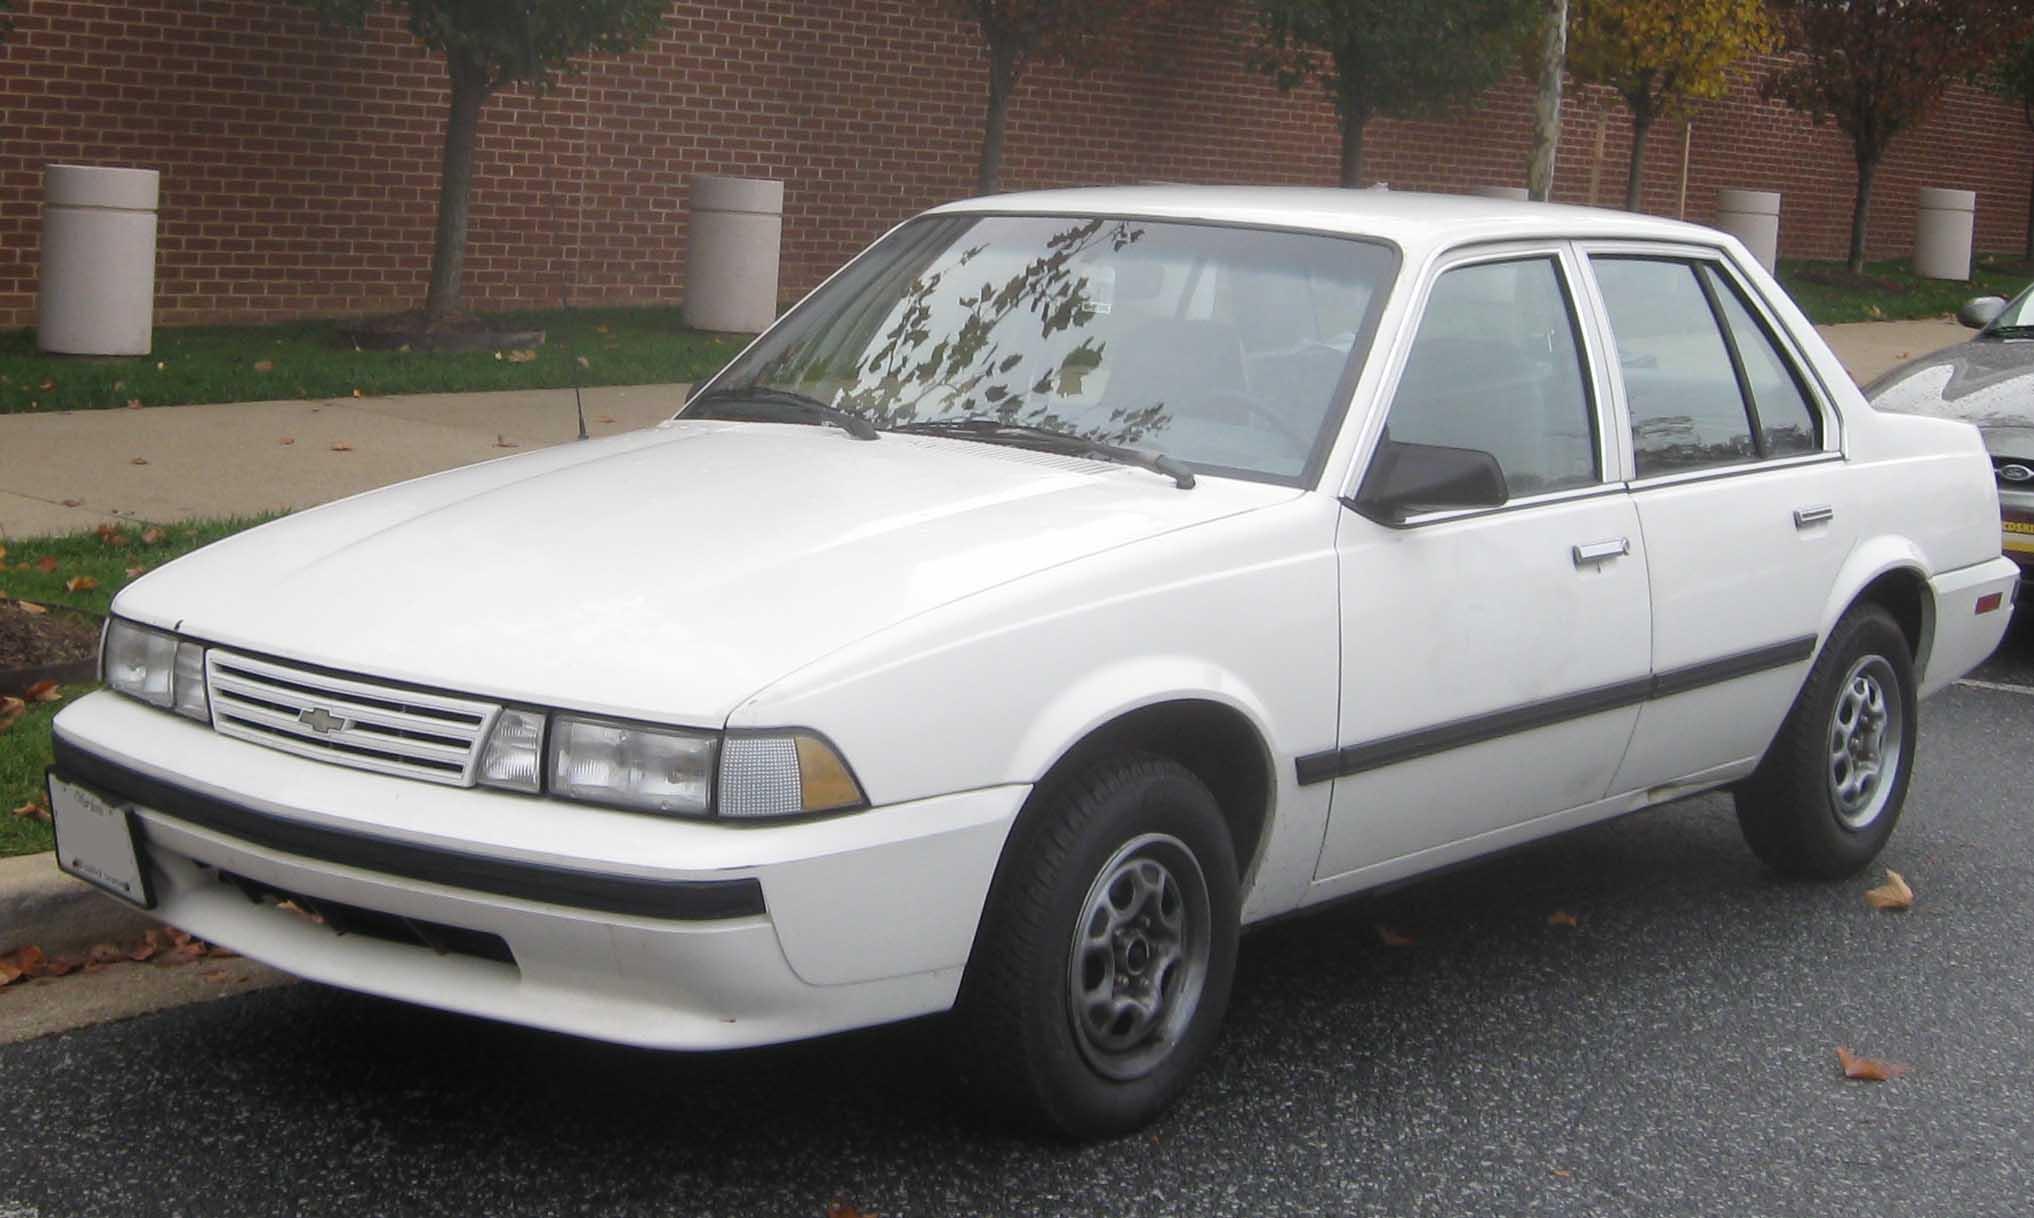 Chevrolet Cavalier 1986 foto - 2